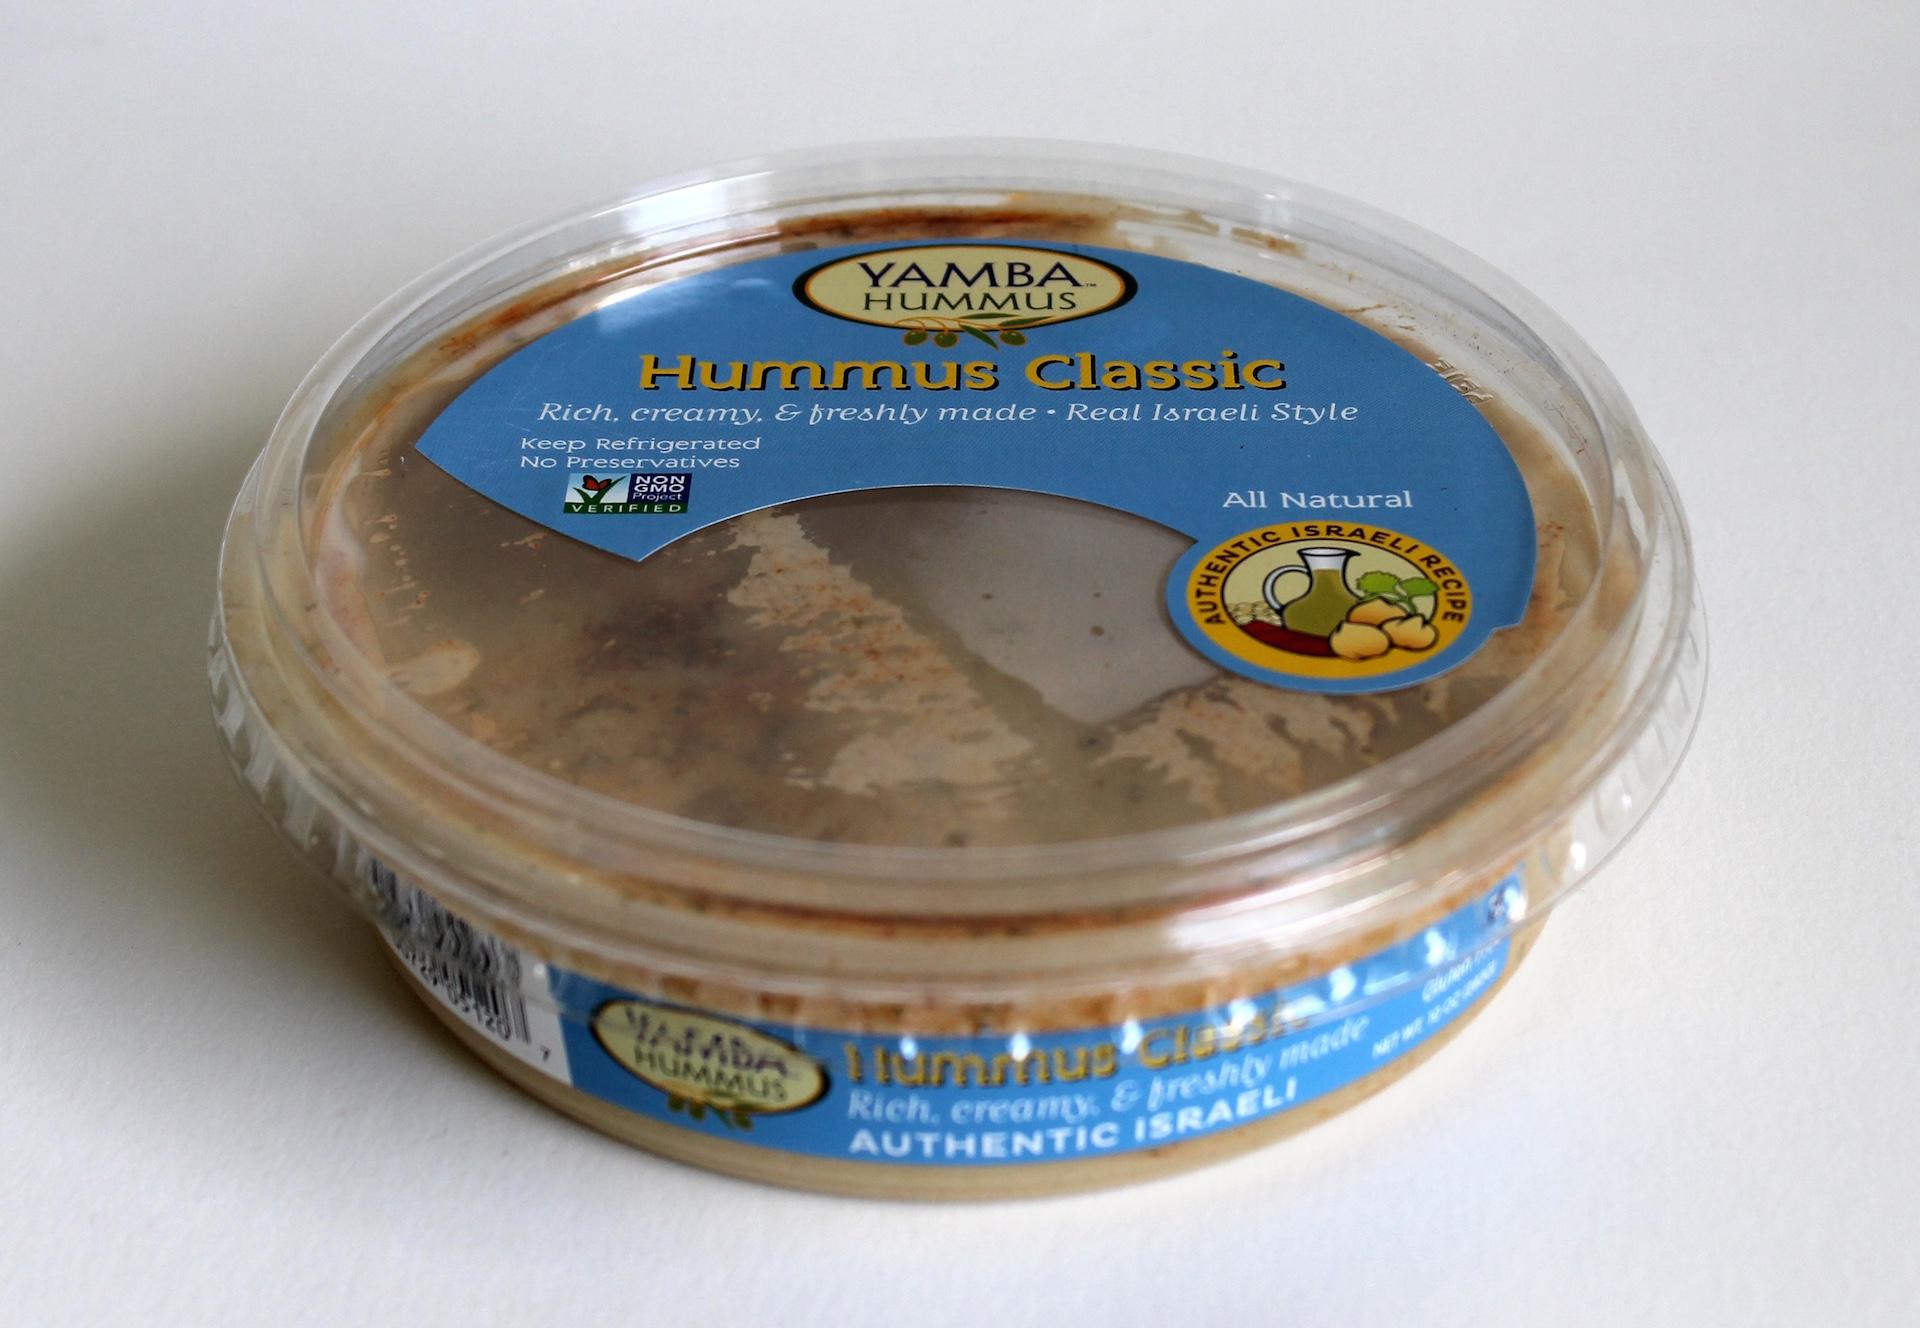 Yamba hummus